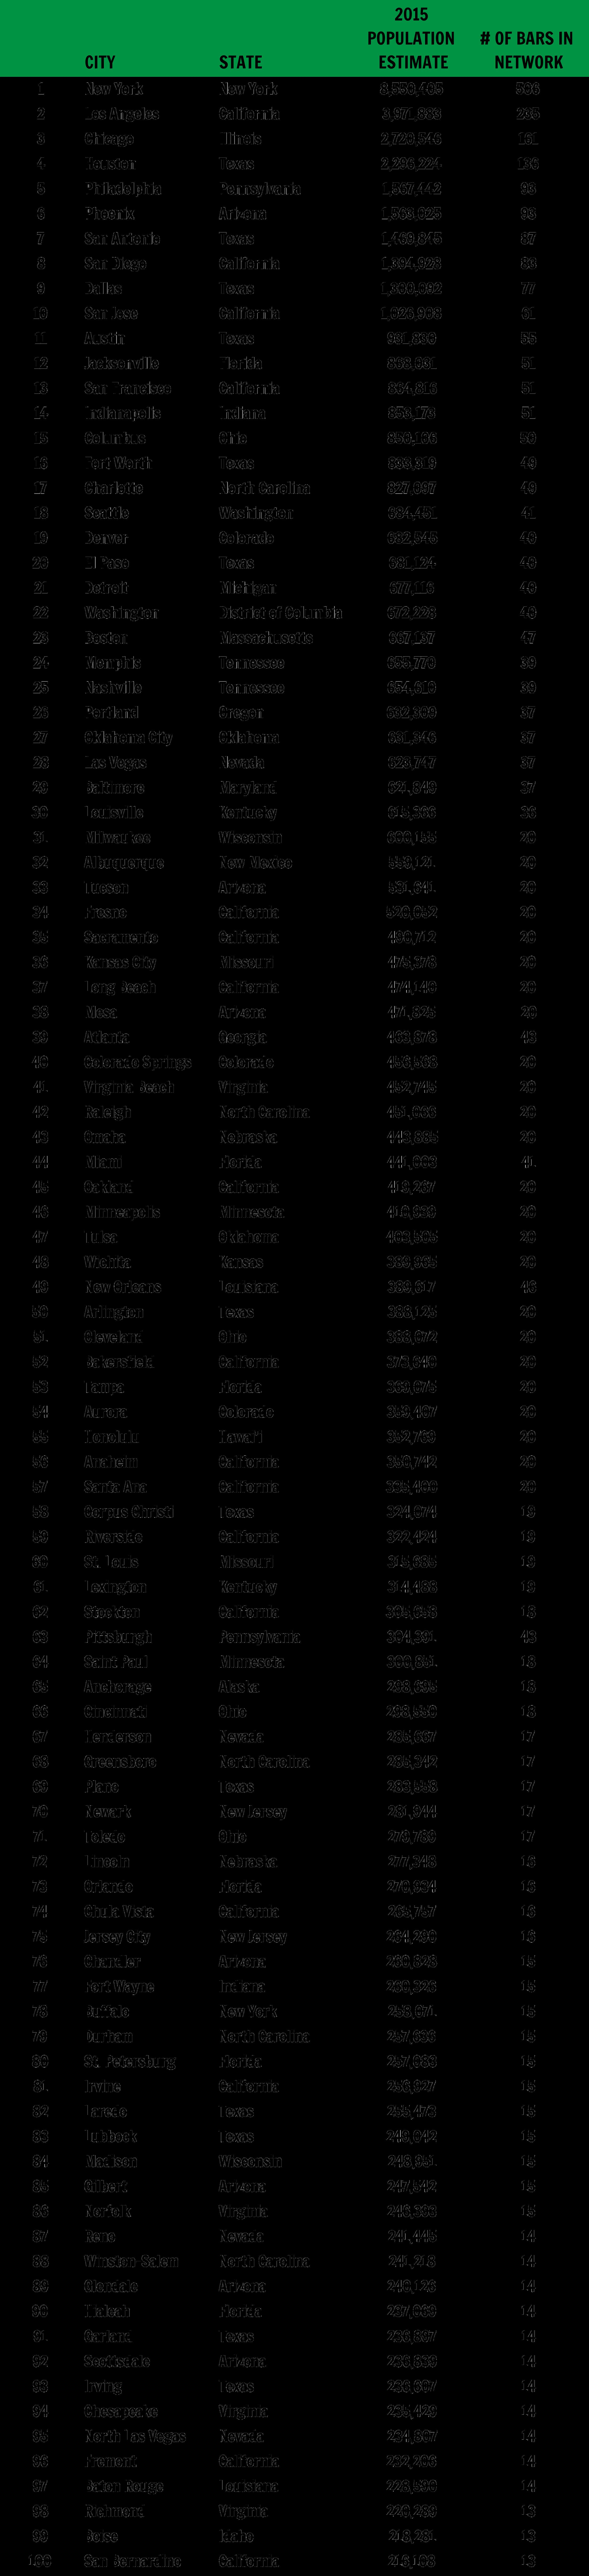 Coaster Network - Sheet1-1.jpg